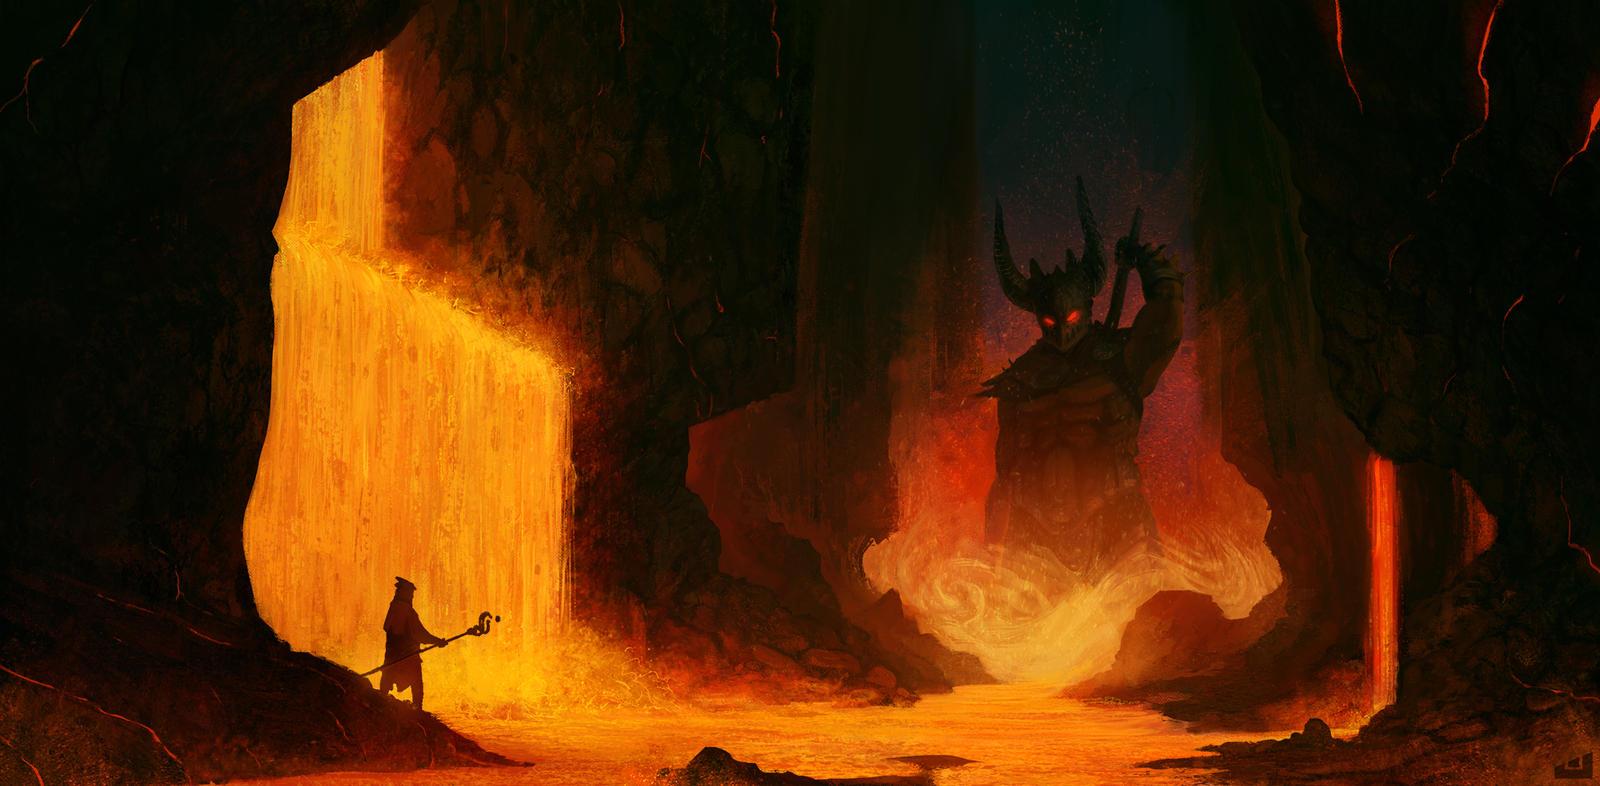 La grotte de Jowe - Page 2 Duel_by_ultimadx-d7bdxwu